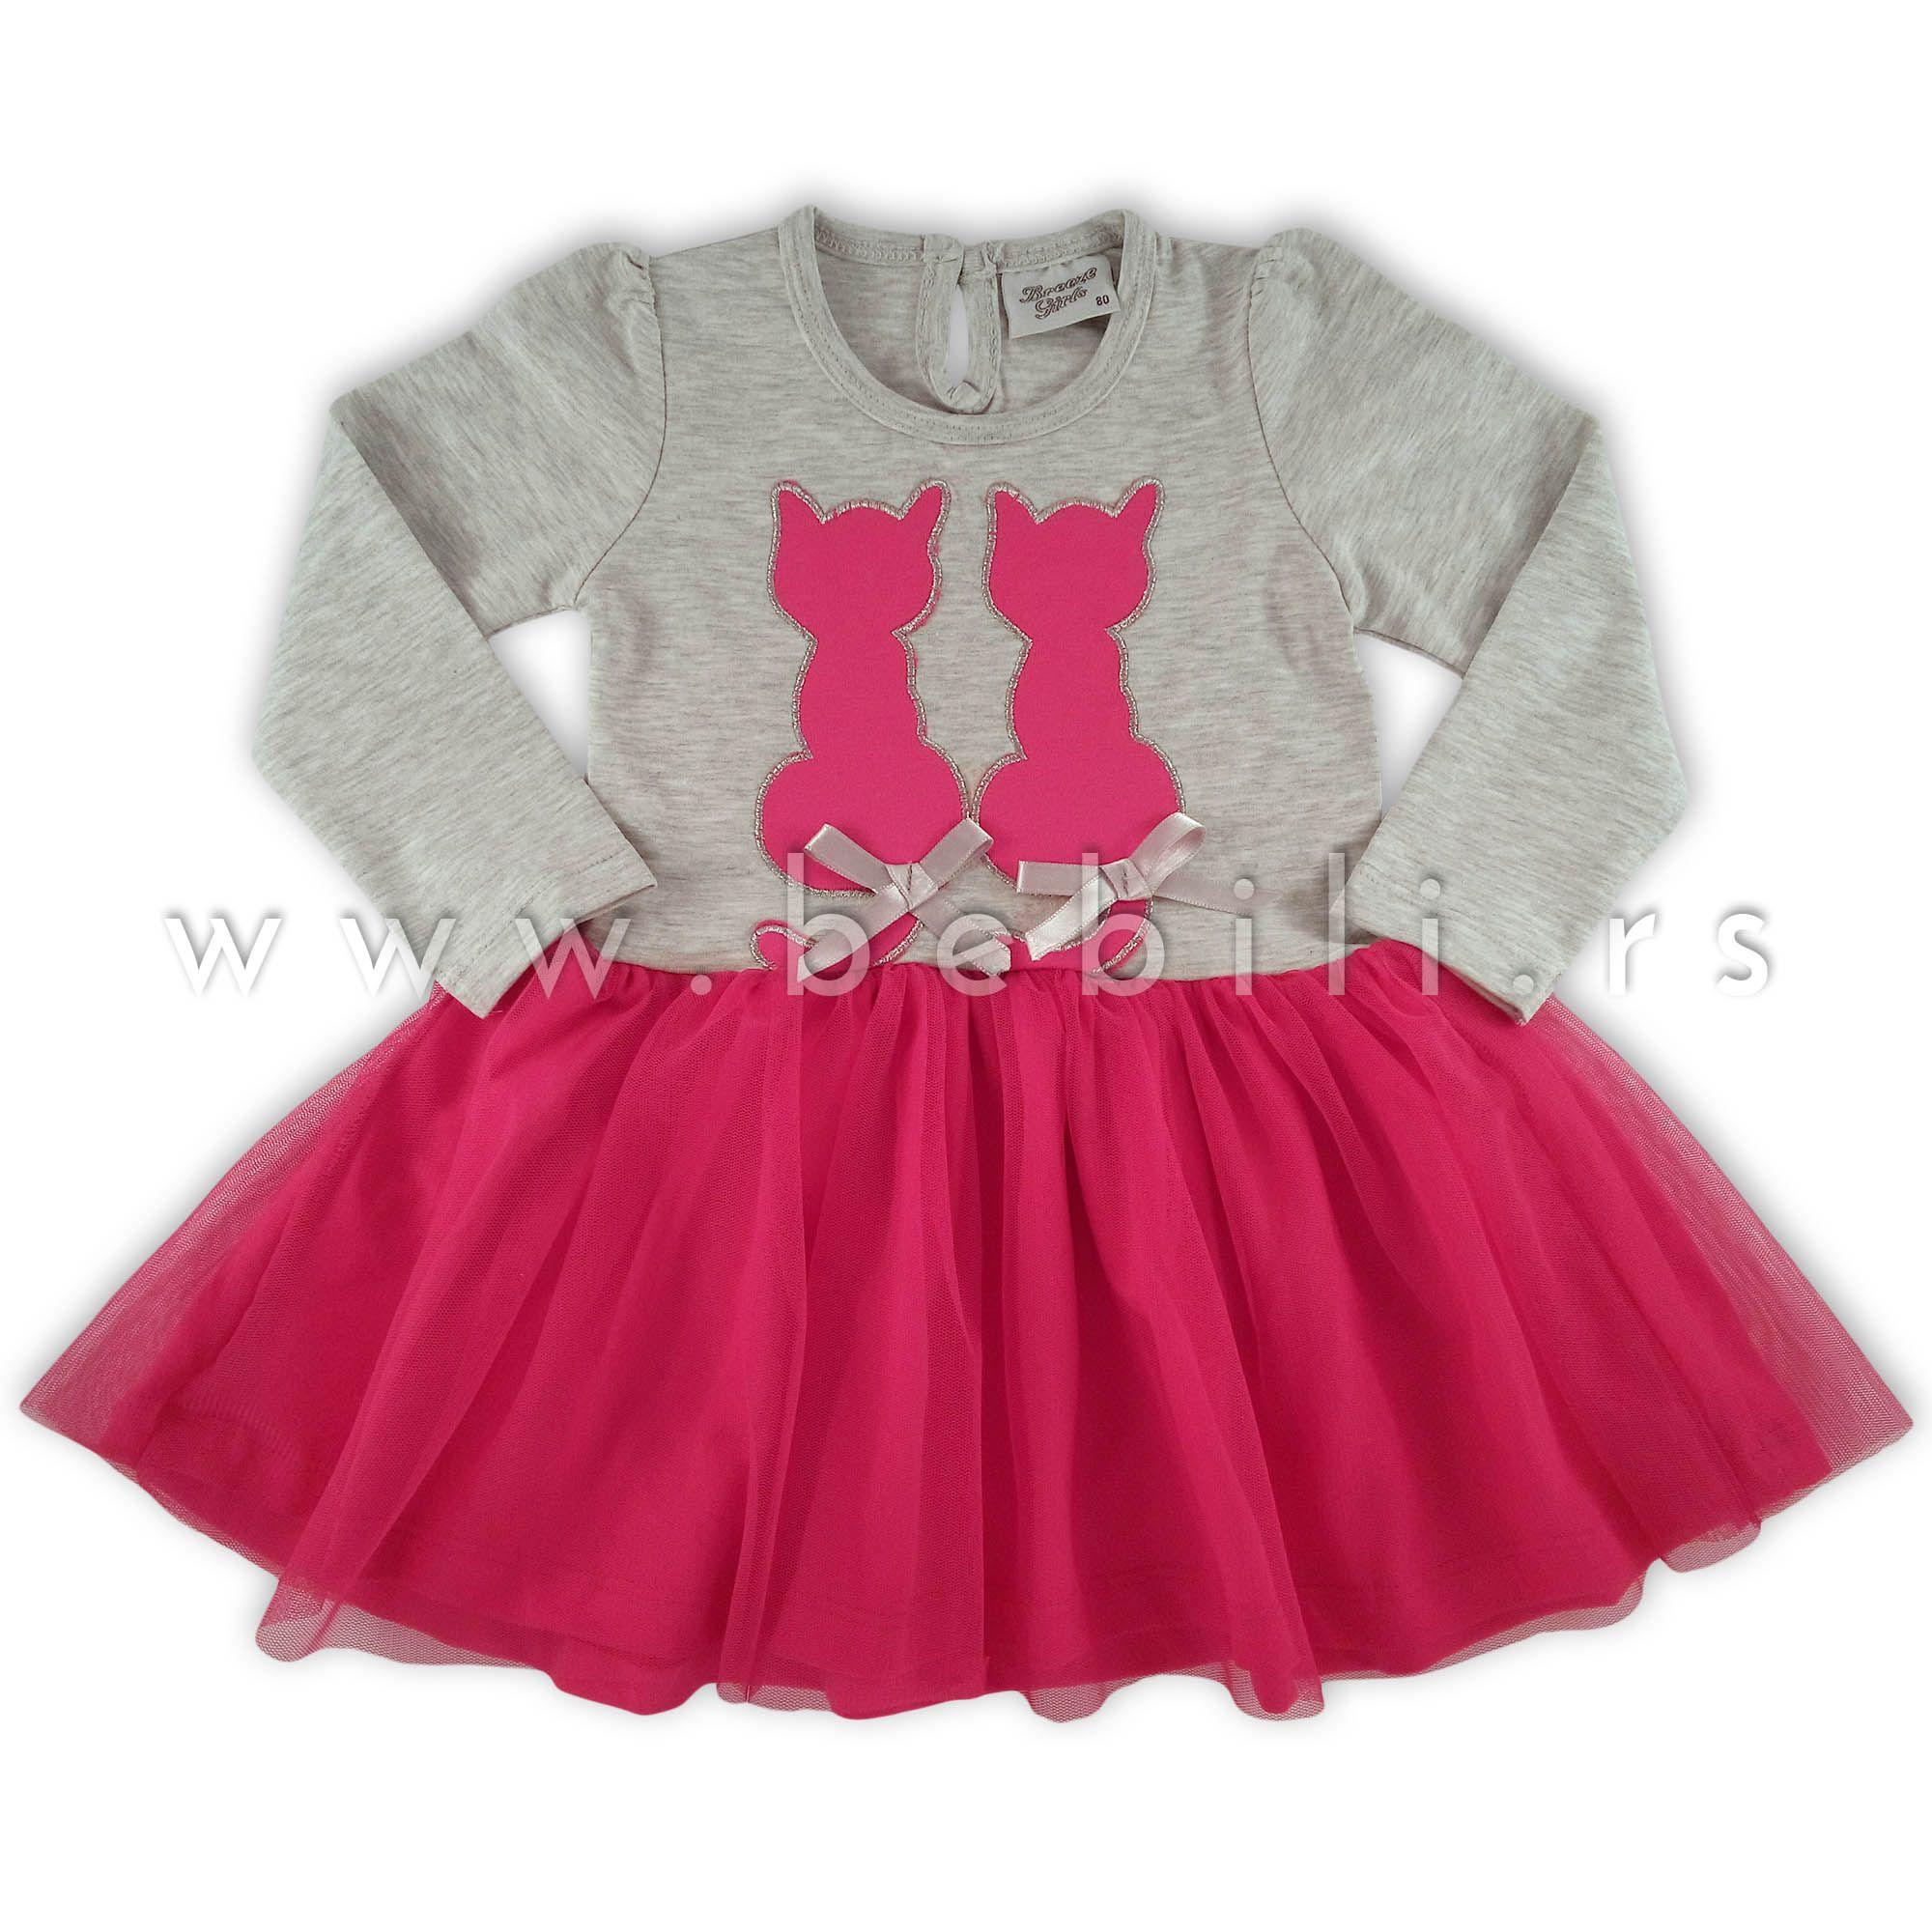 Haljina Za Devojcice Breeze Two Cats Fashion Bebe Skater Skirt